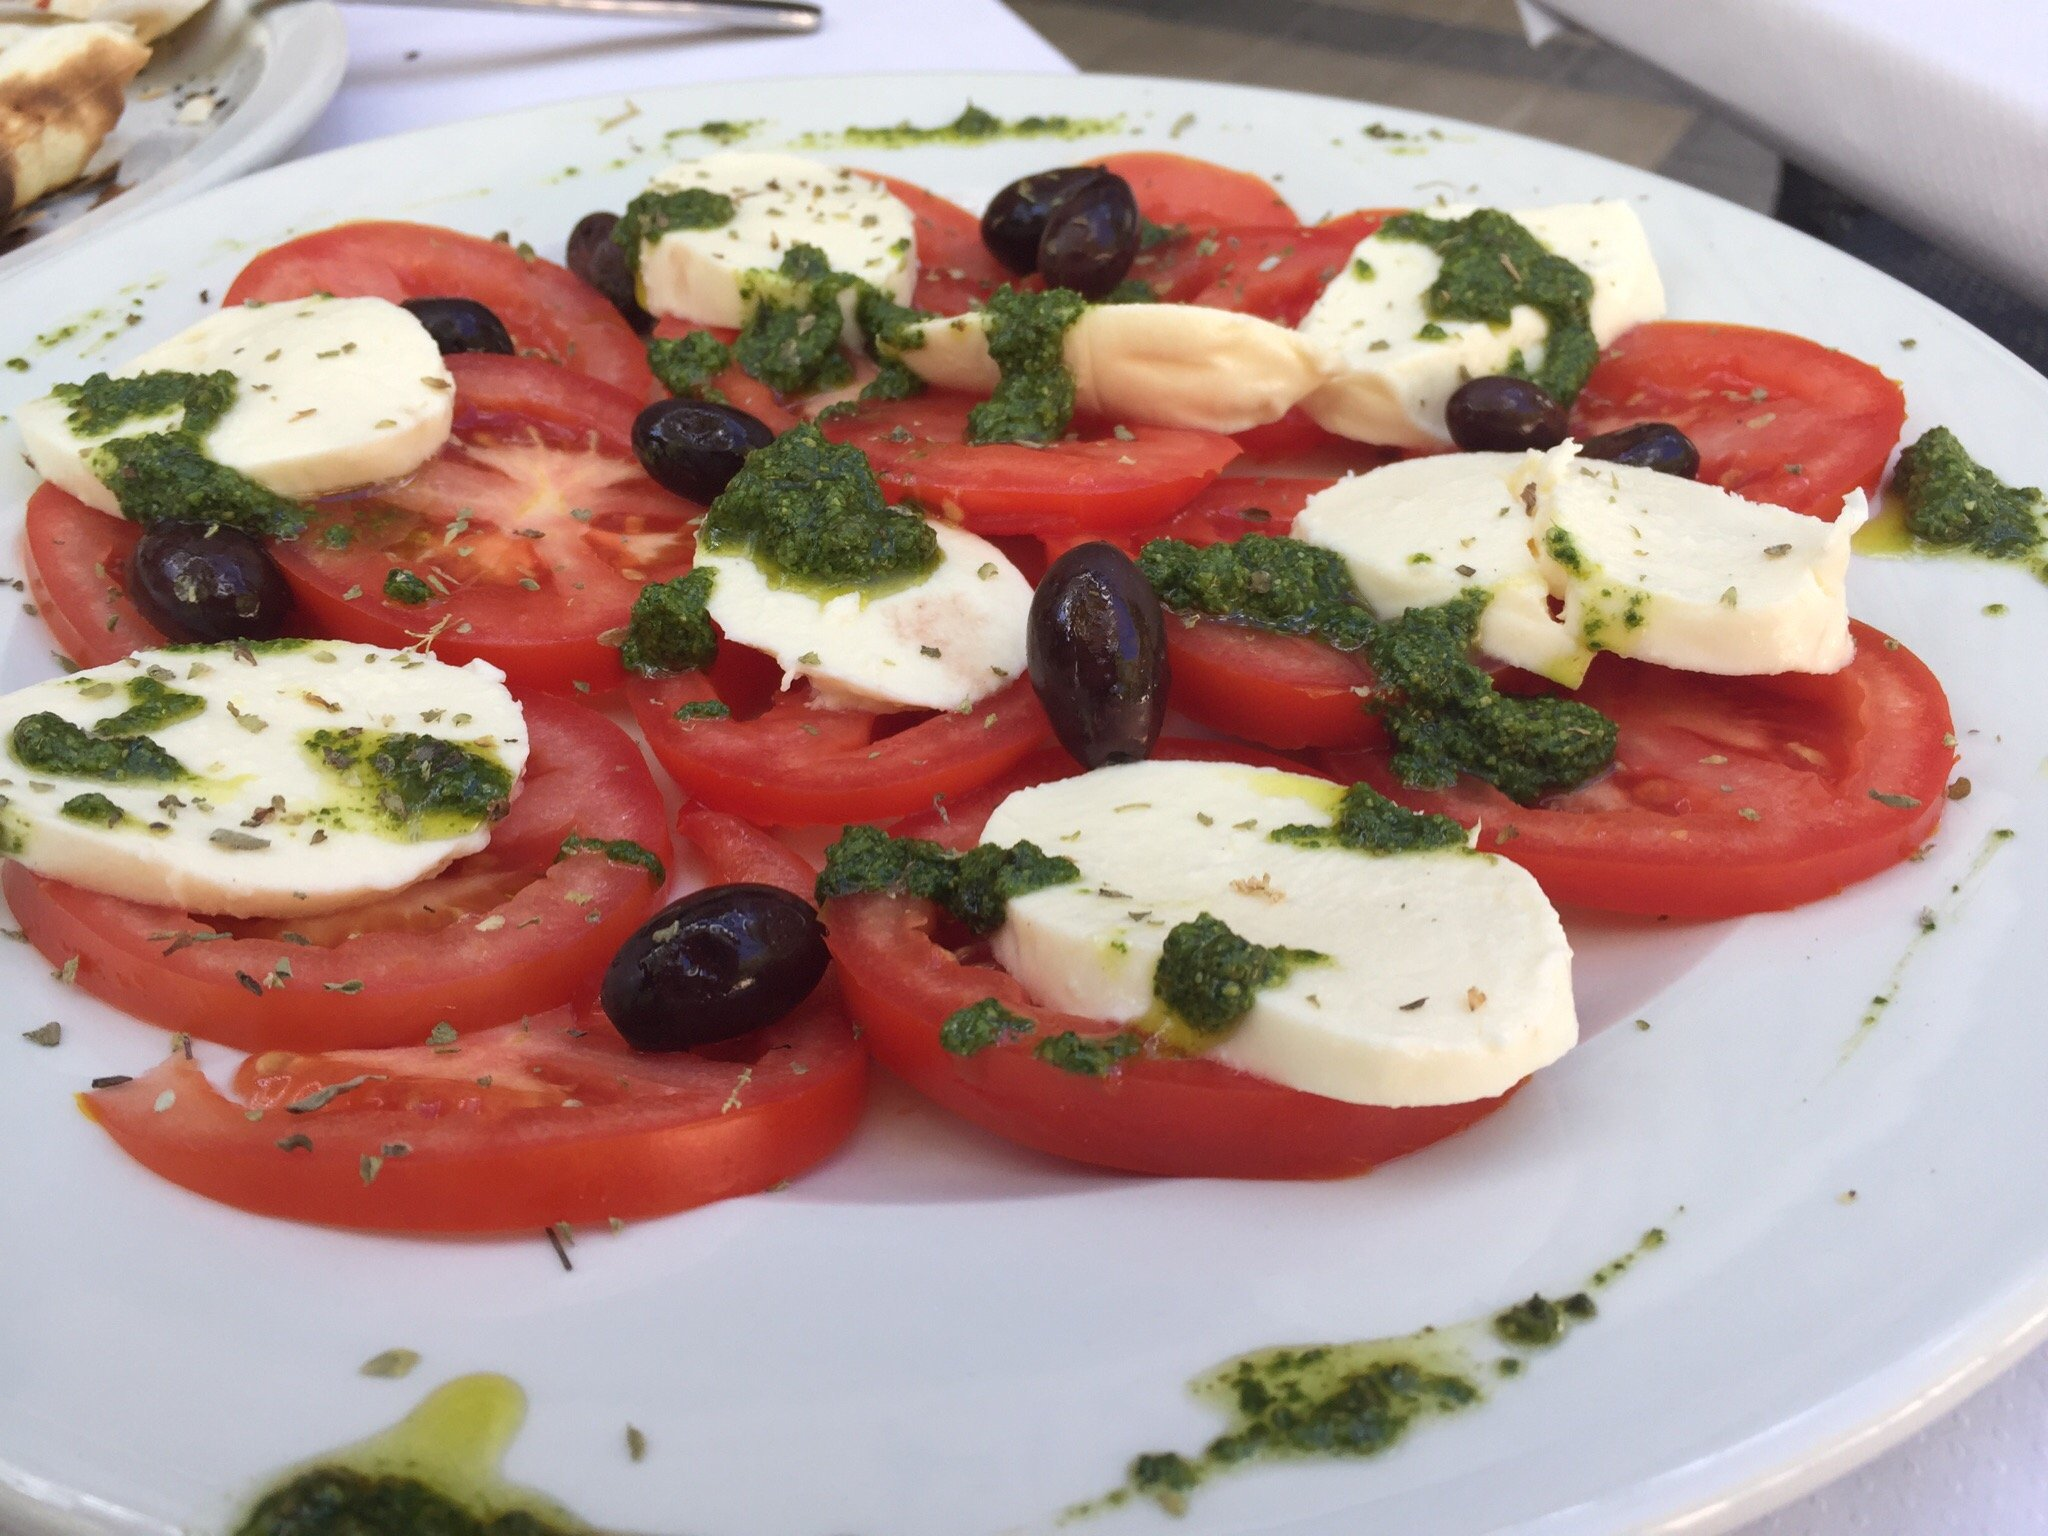 Most Popular Italian food in Esporles, Spain